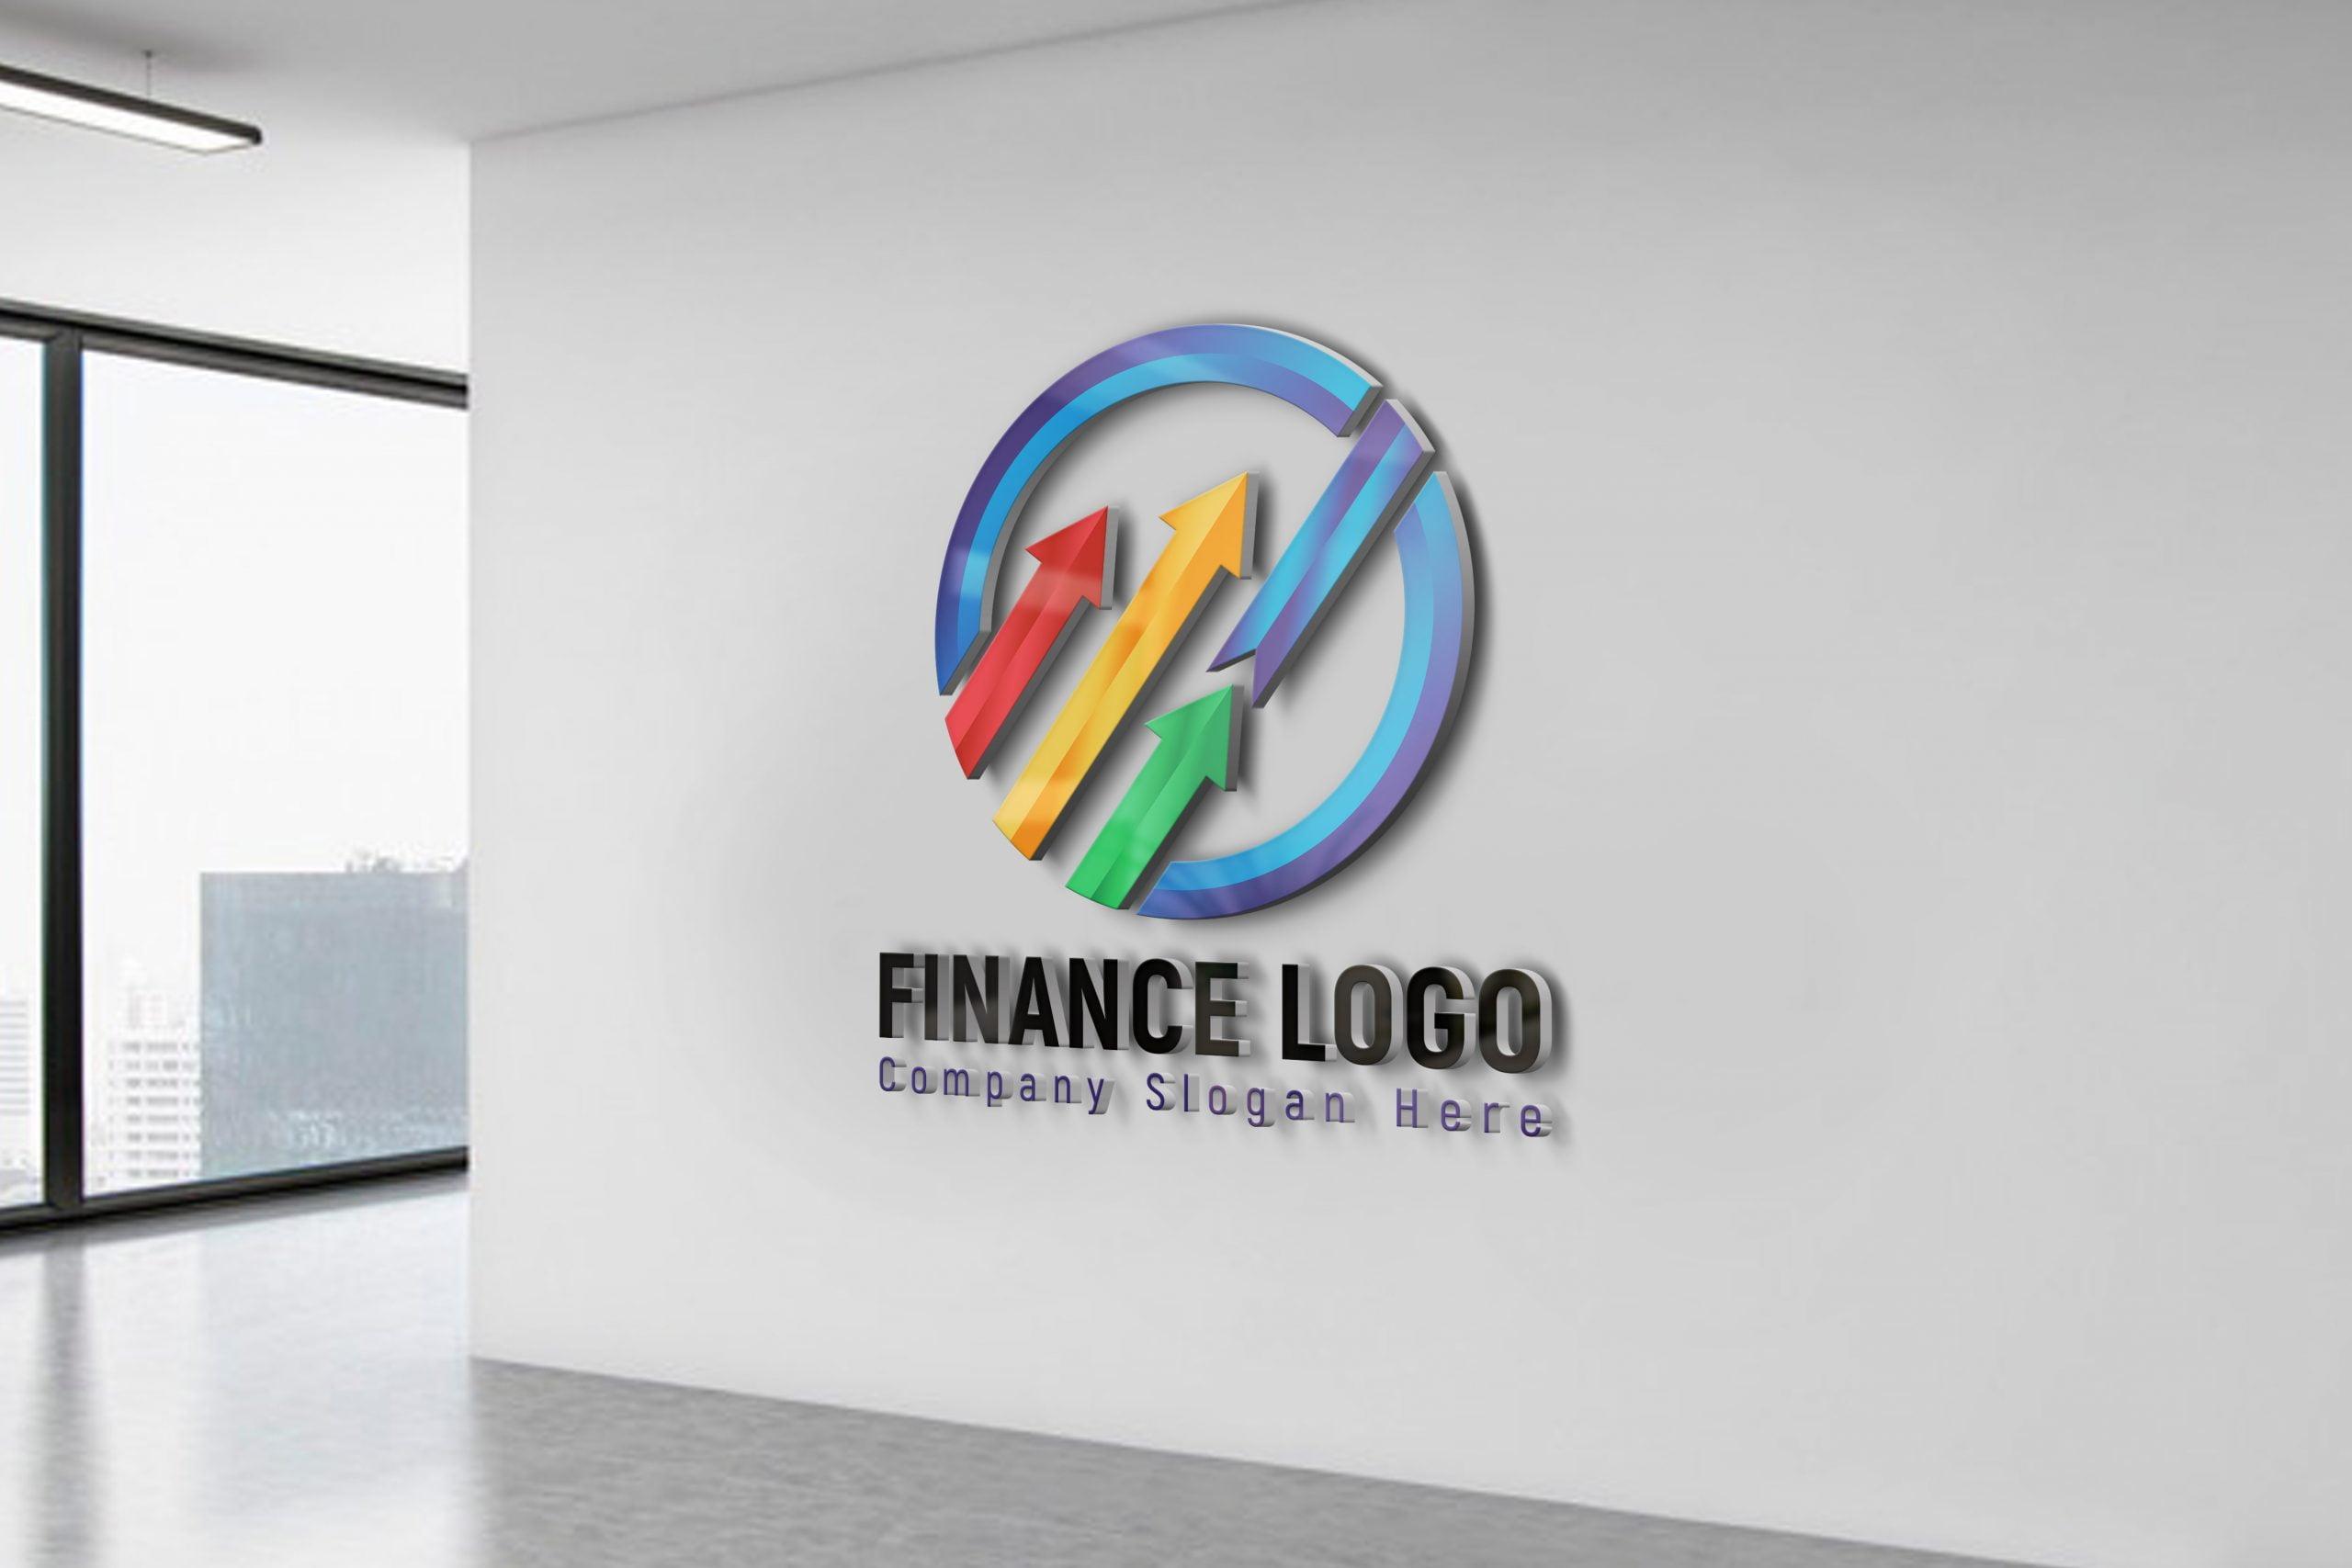 Finance Company Logo Design on office wall